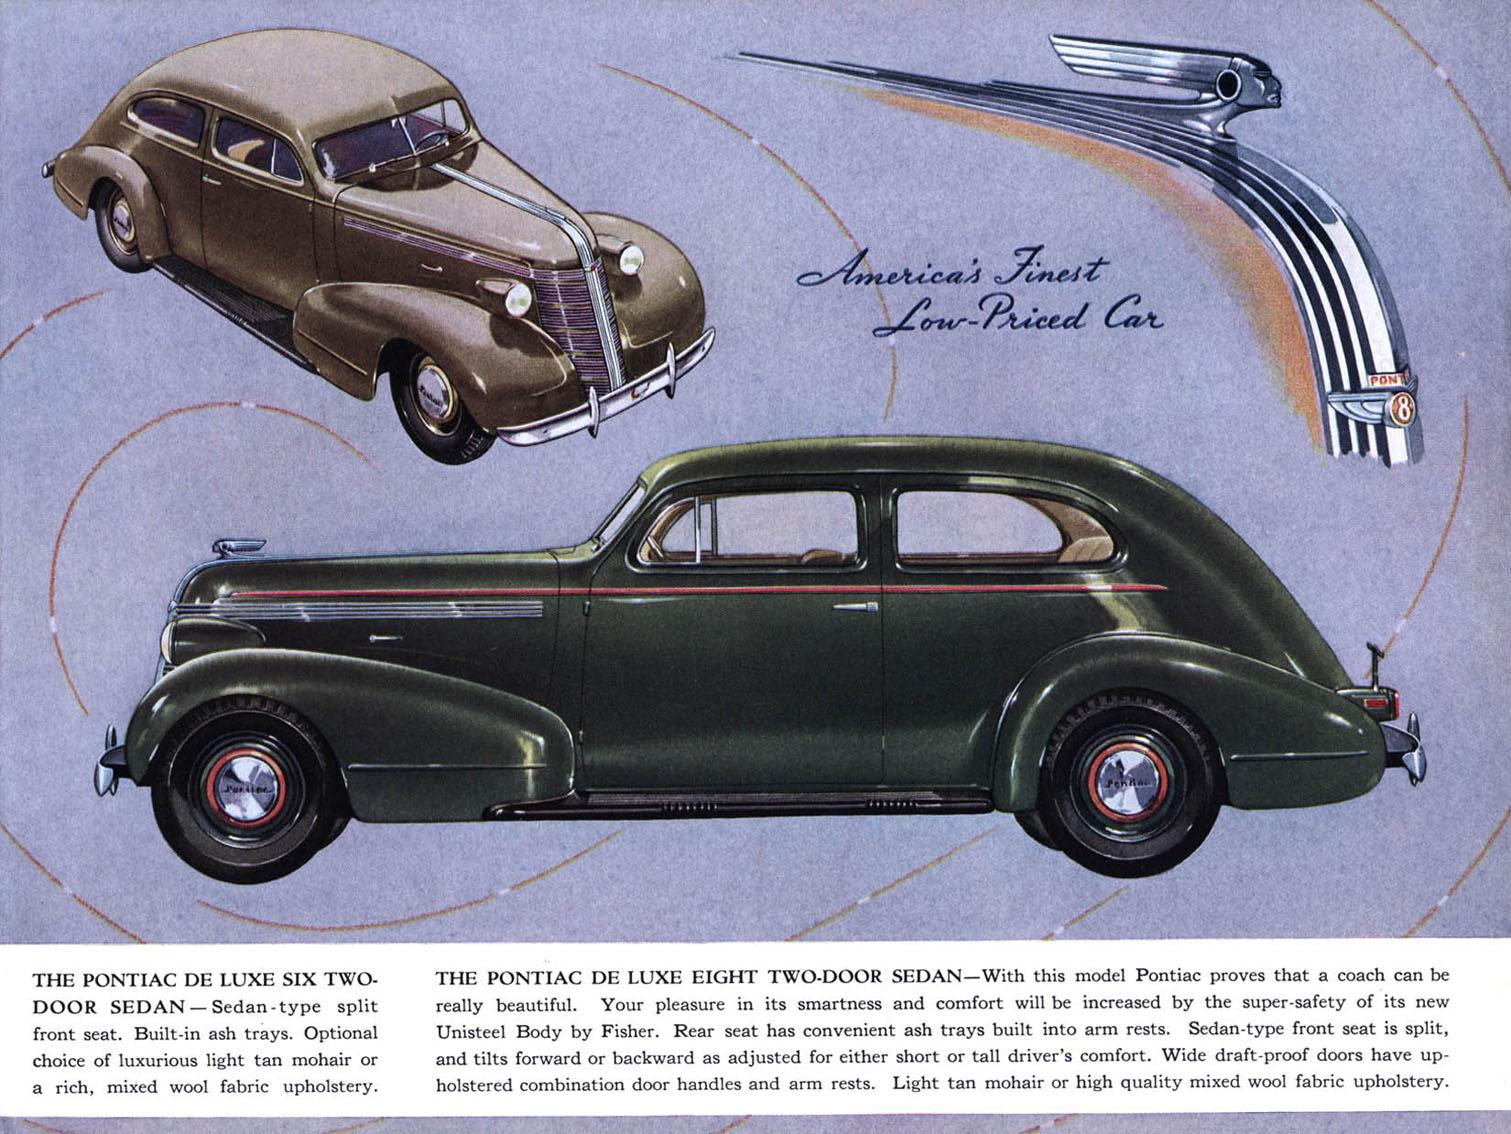 23 best 1937 pontiac images on Pinterest   Old school cars, Vintage ...